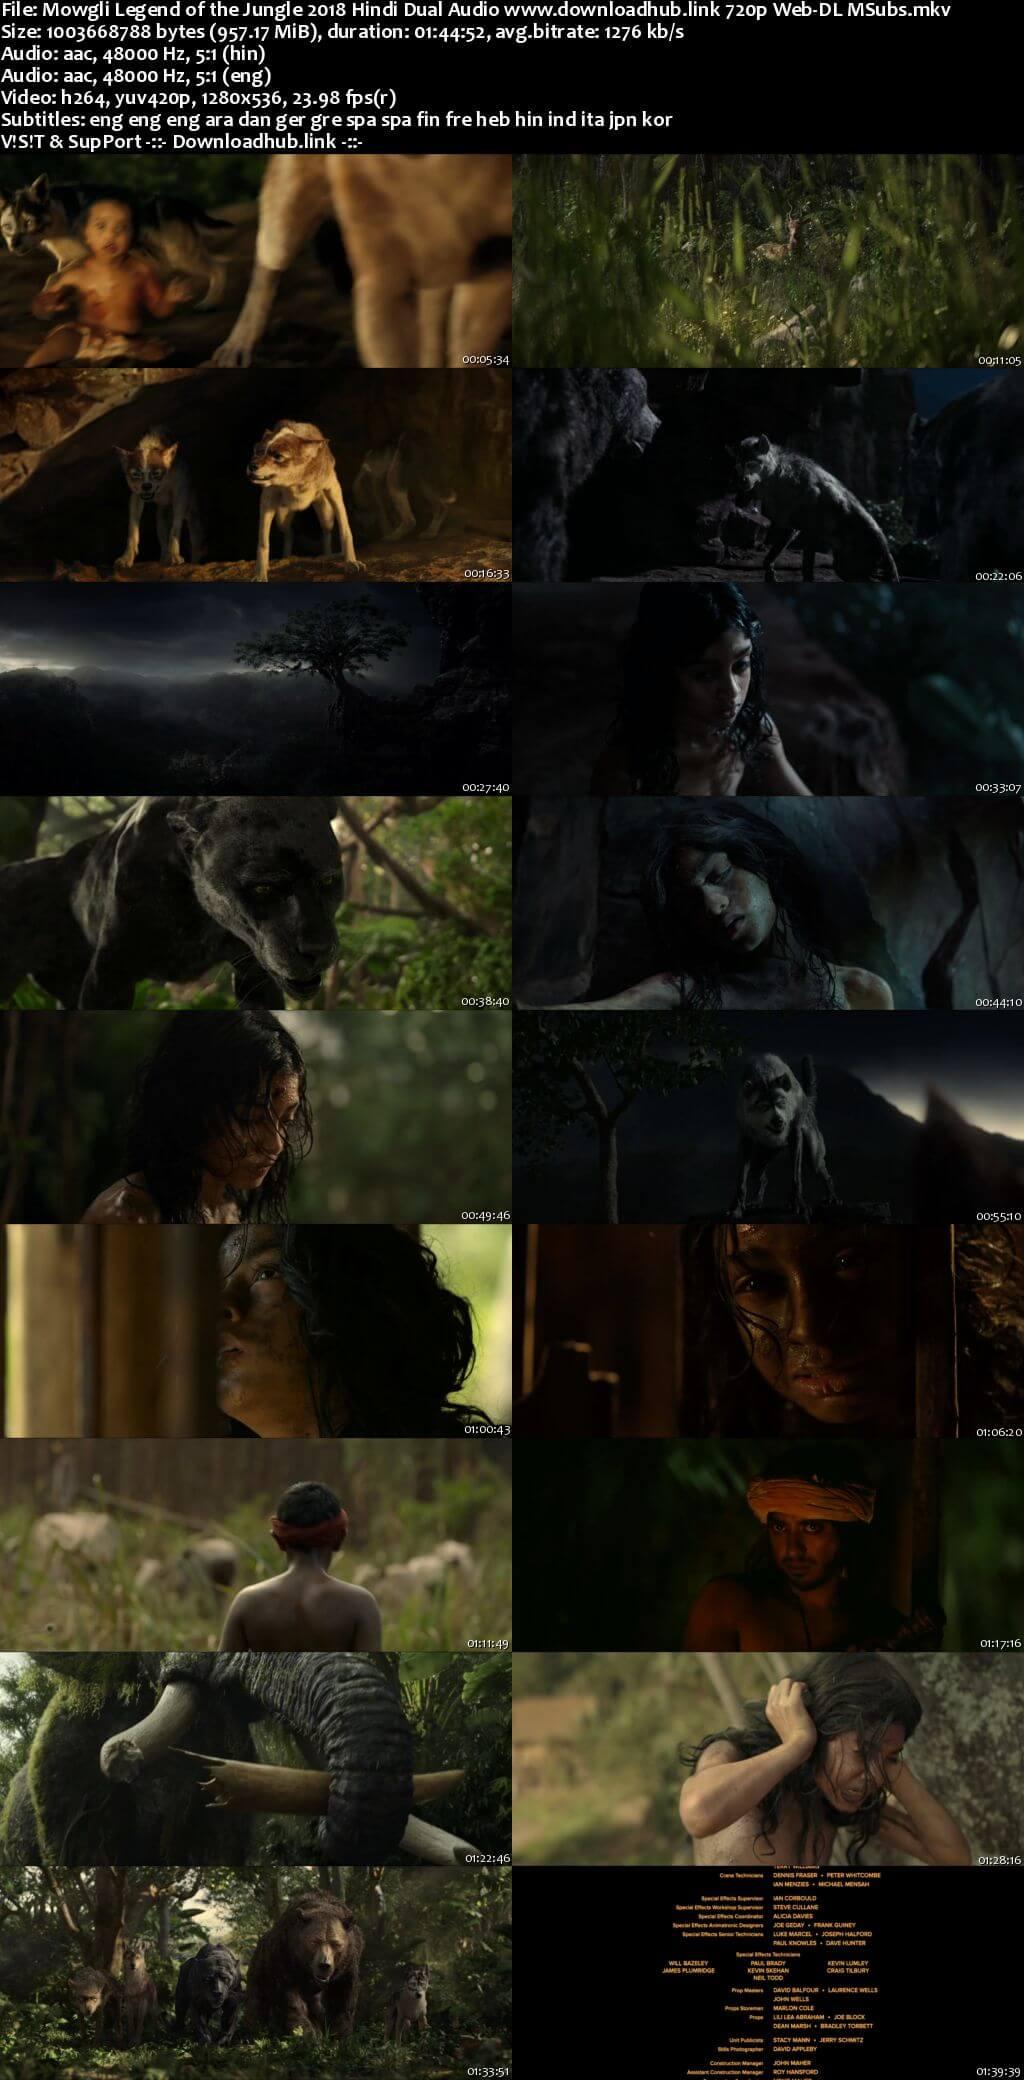 Mowgli Legend of the Jungle 2018 Hindi Dual Audio 720p Web-DL MSubs